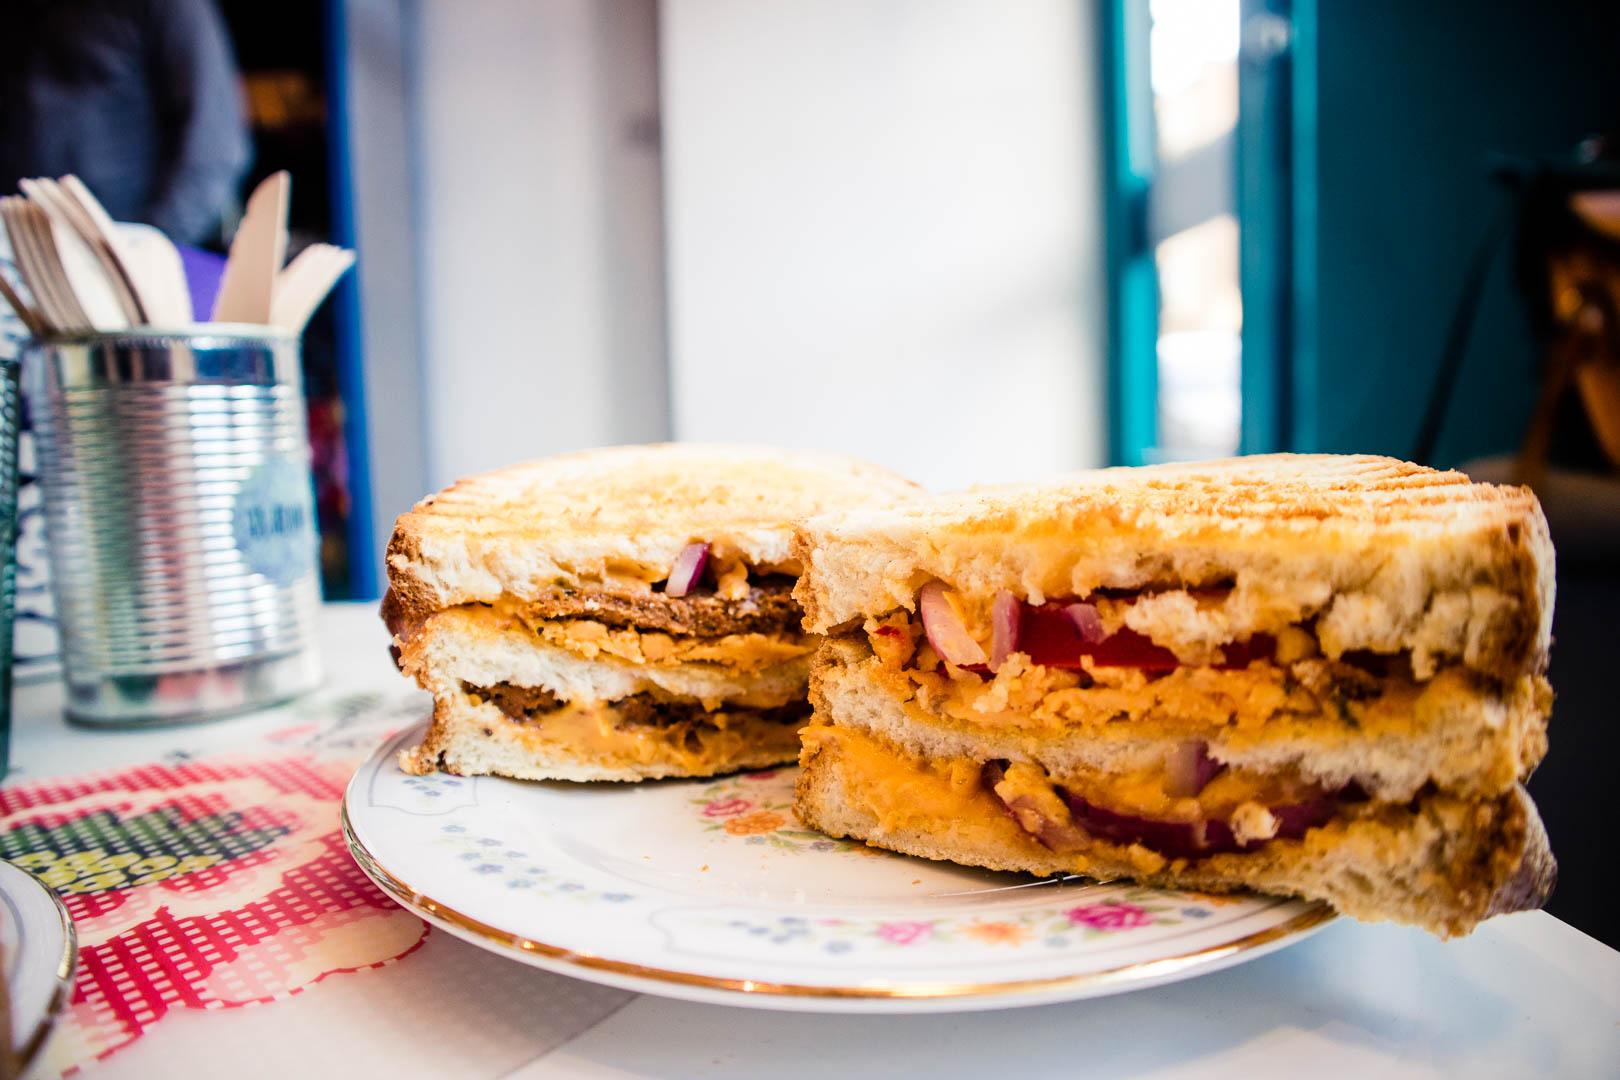 The Big Cheese Steak double decker sandwich at In Bloom Glasgow.